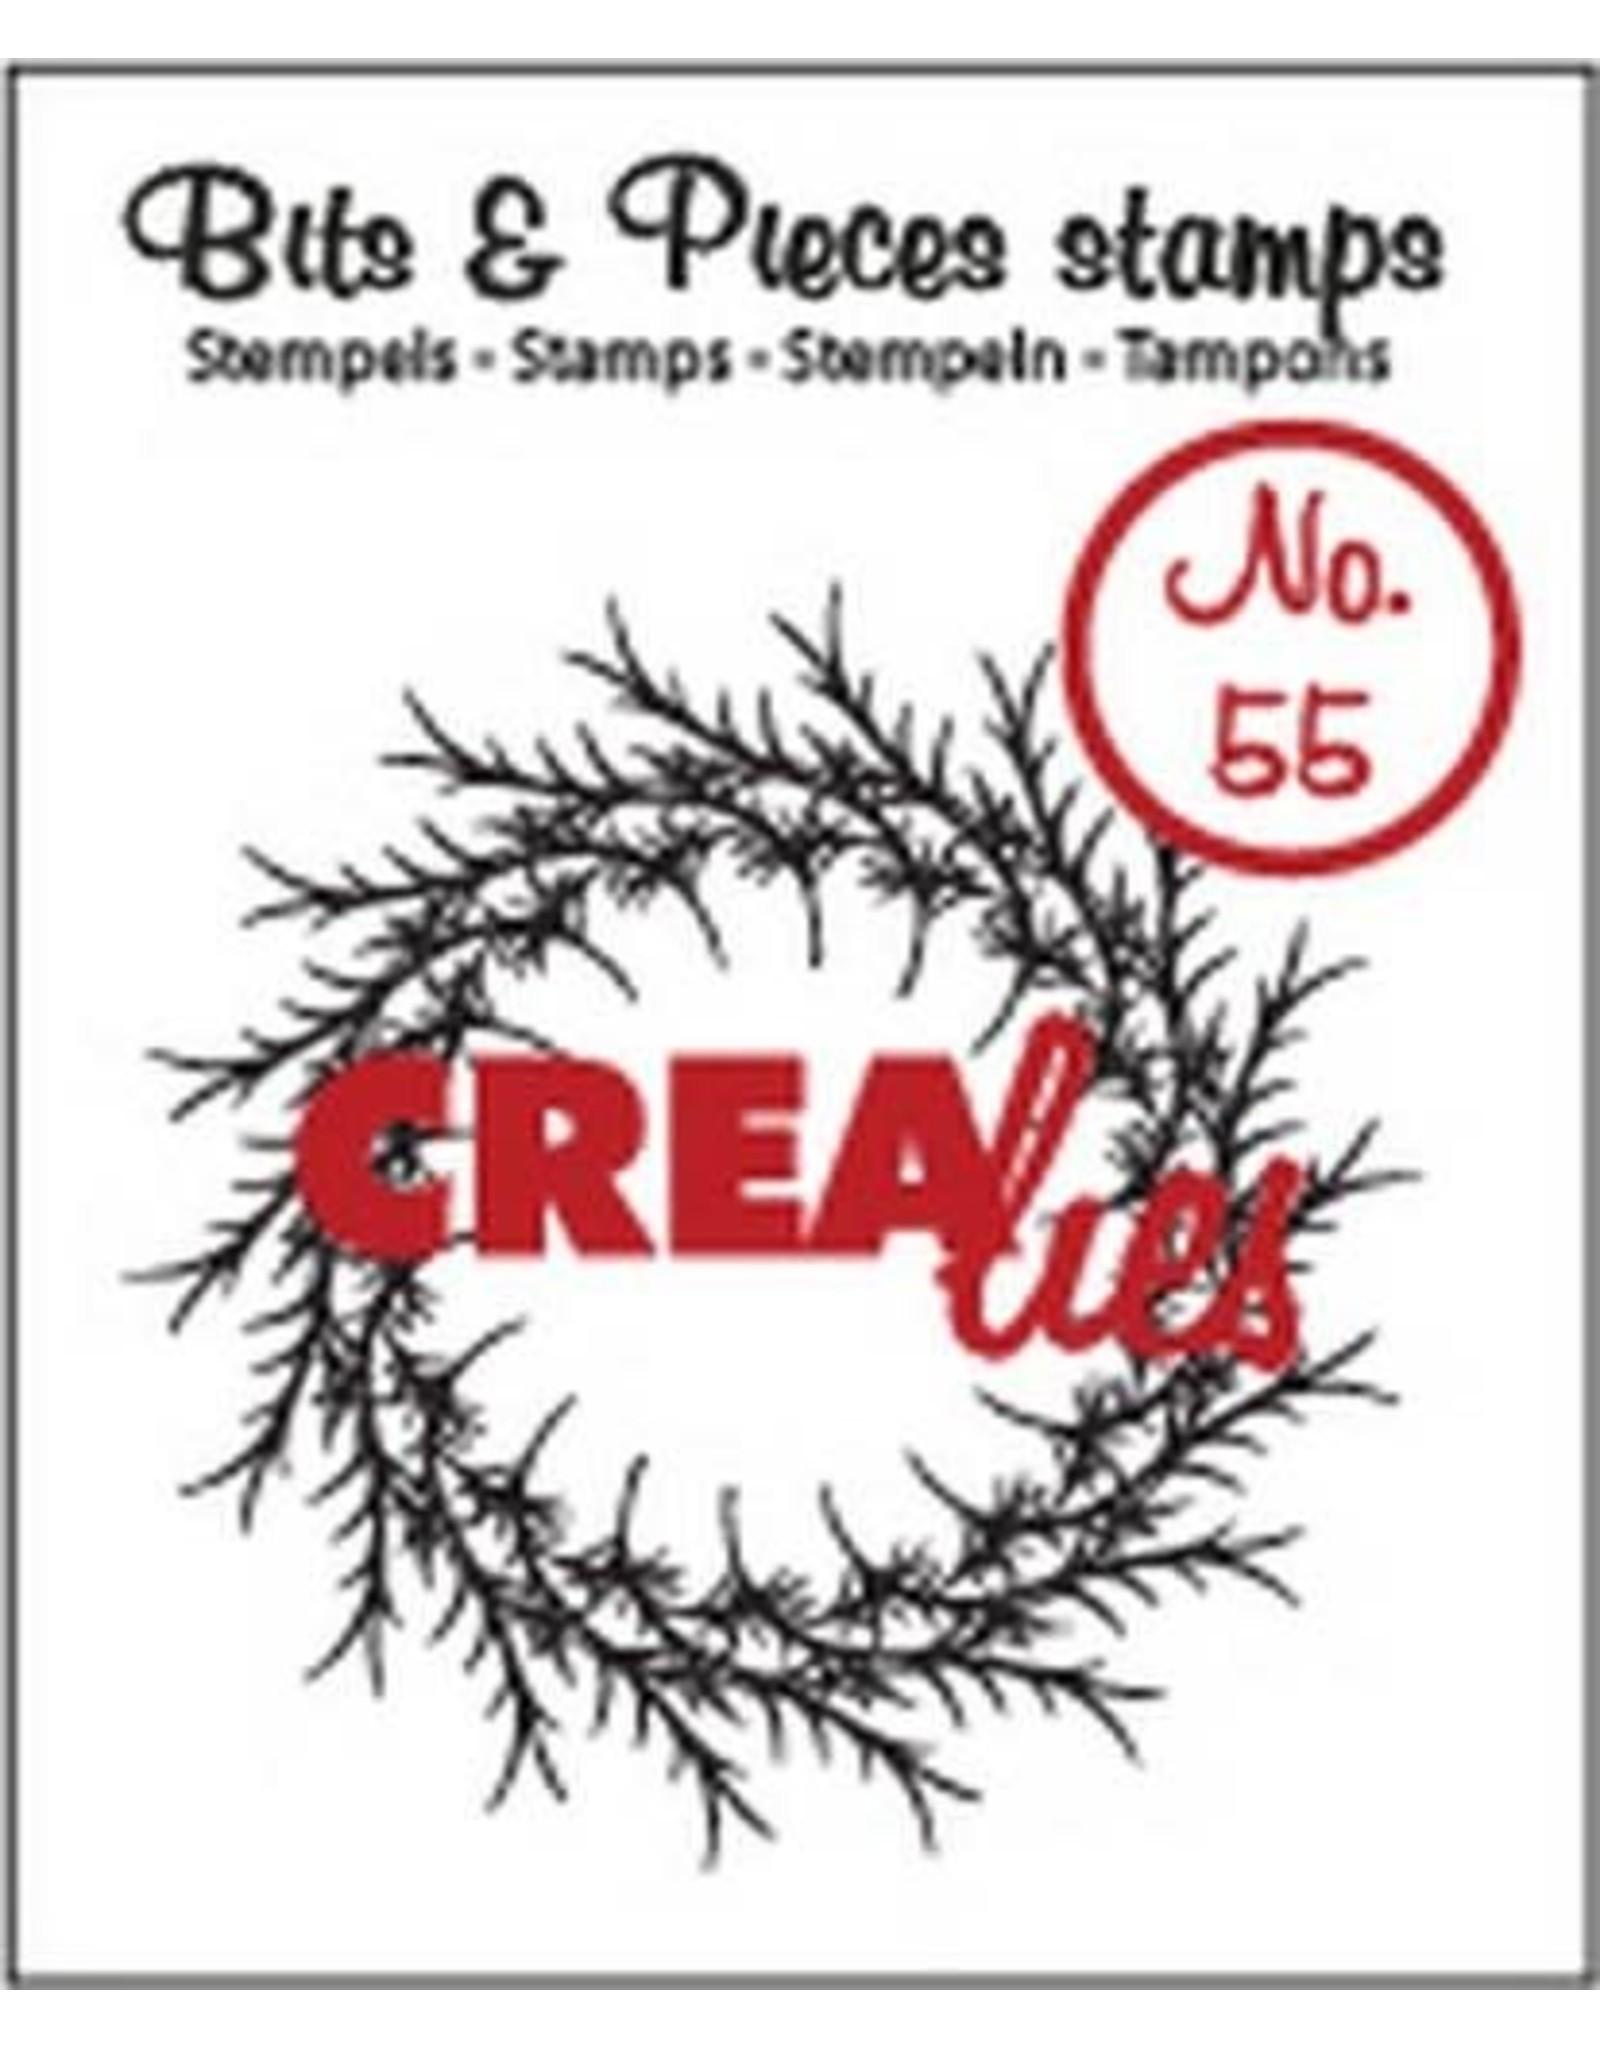 Crealies Crealies Clearstamp Bits&Pieces no. 55 krans